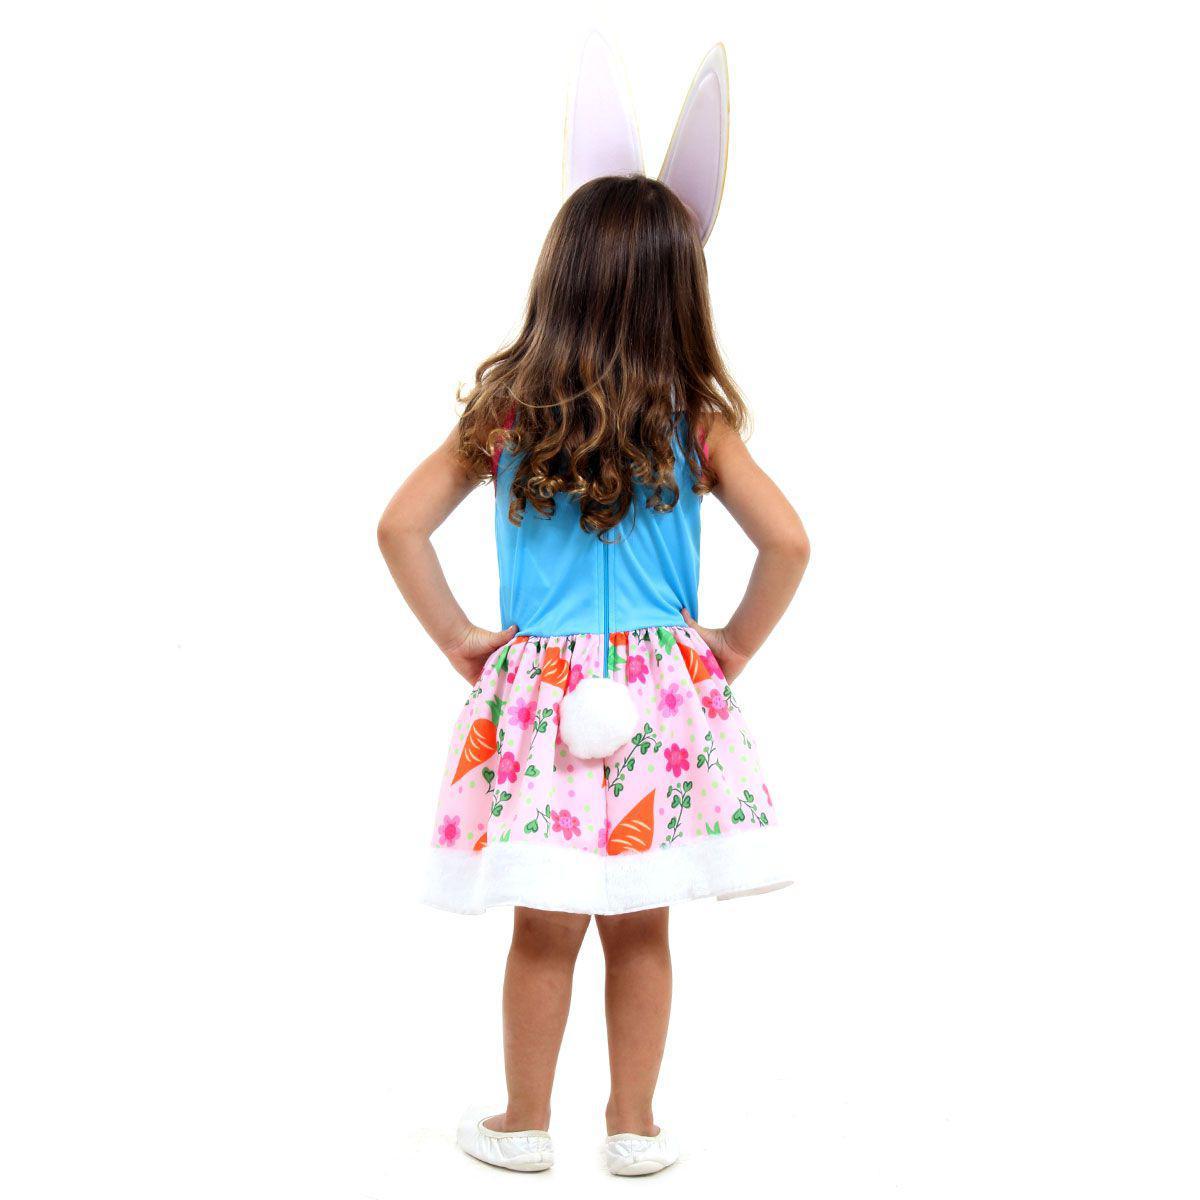 Fantasia Bree Bunny Infantil Coelha Enchantimals Fantasia